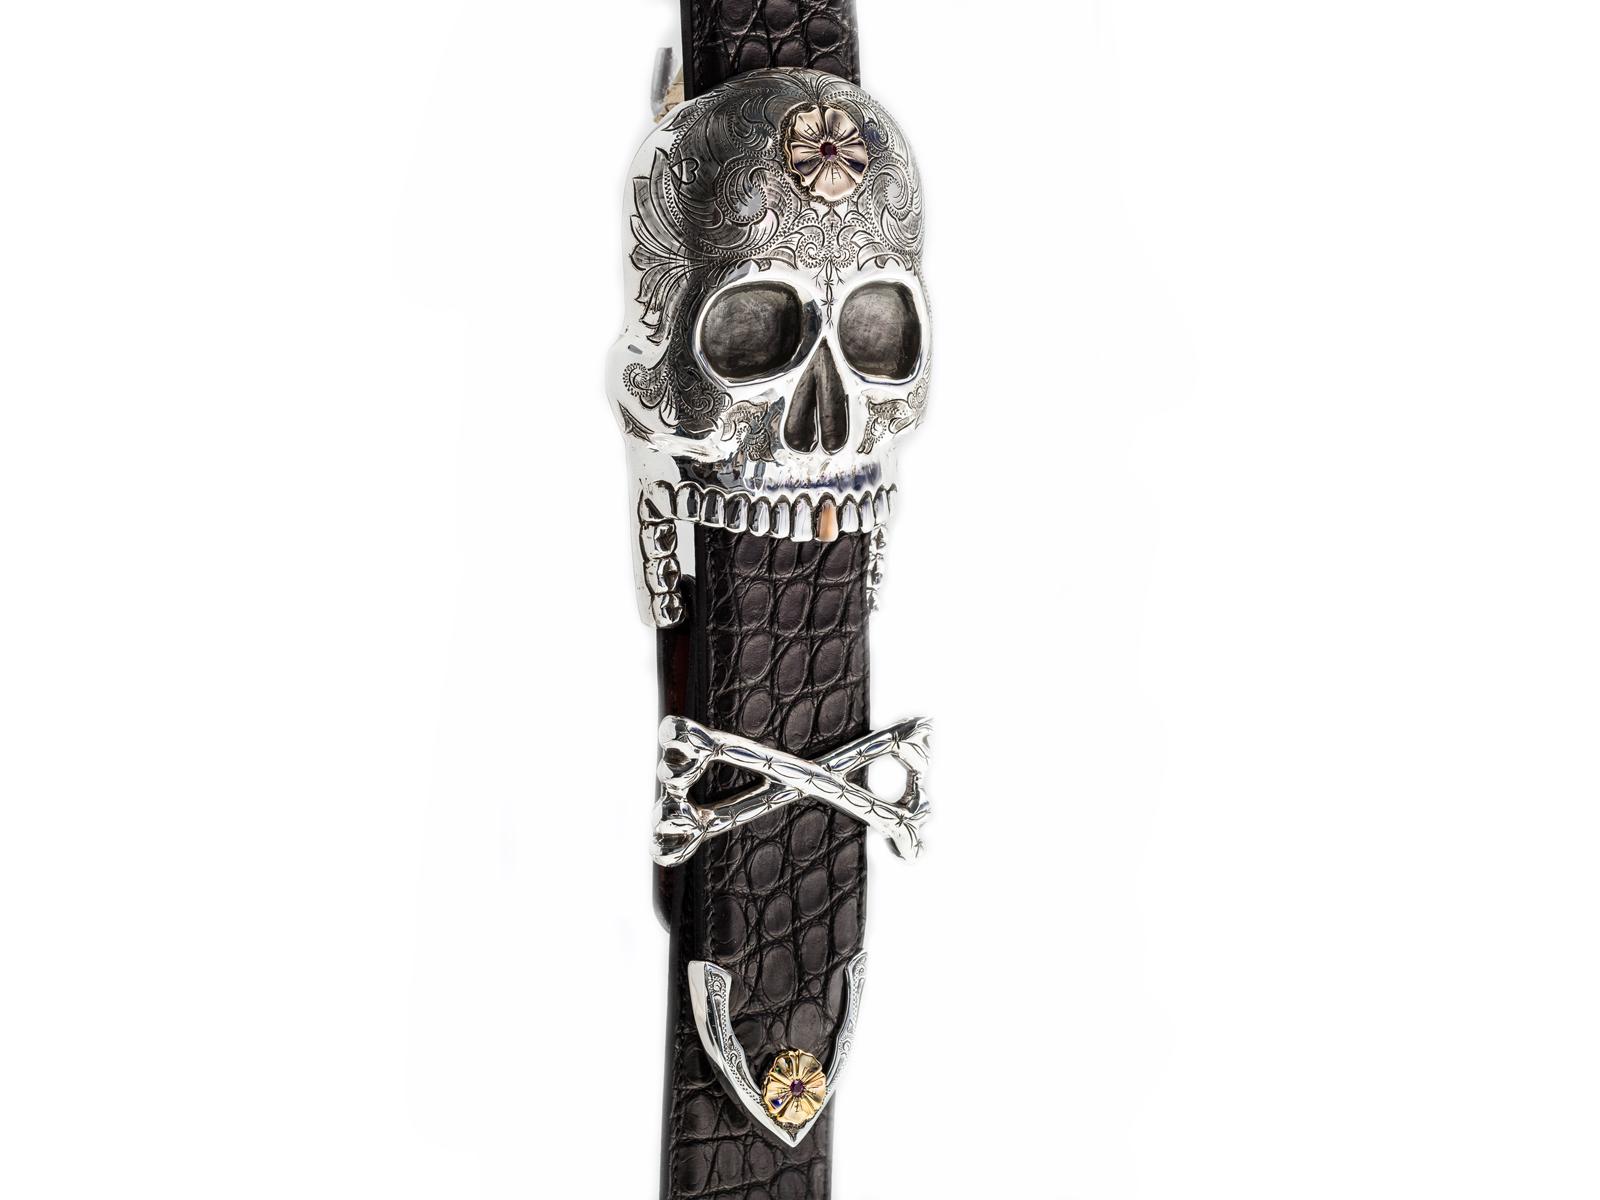 Skull Buckle Set By Santa Fe Artist Douglas Magnus